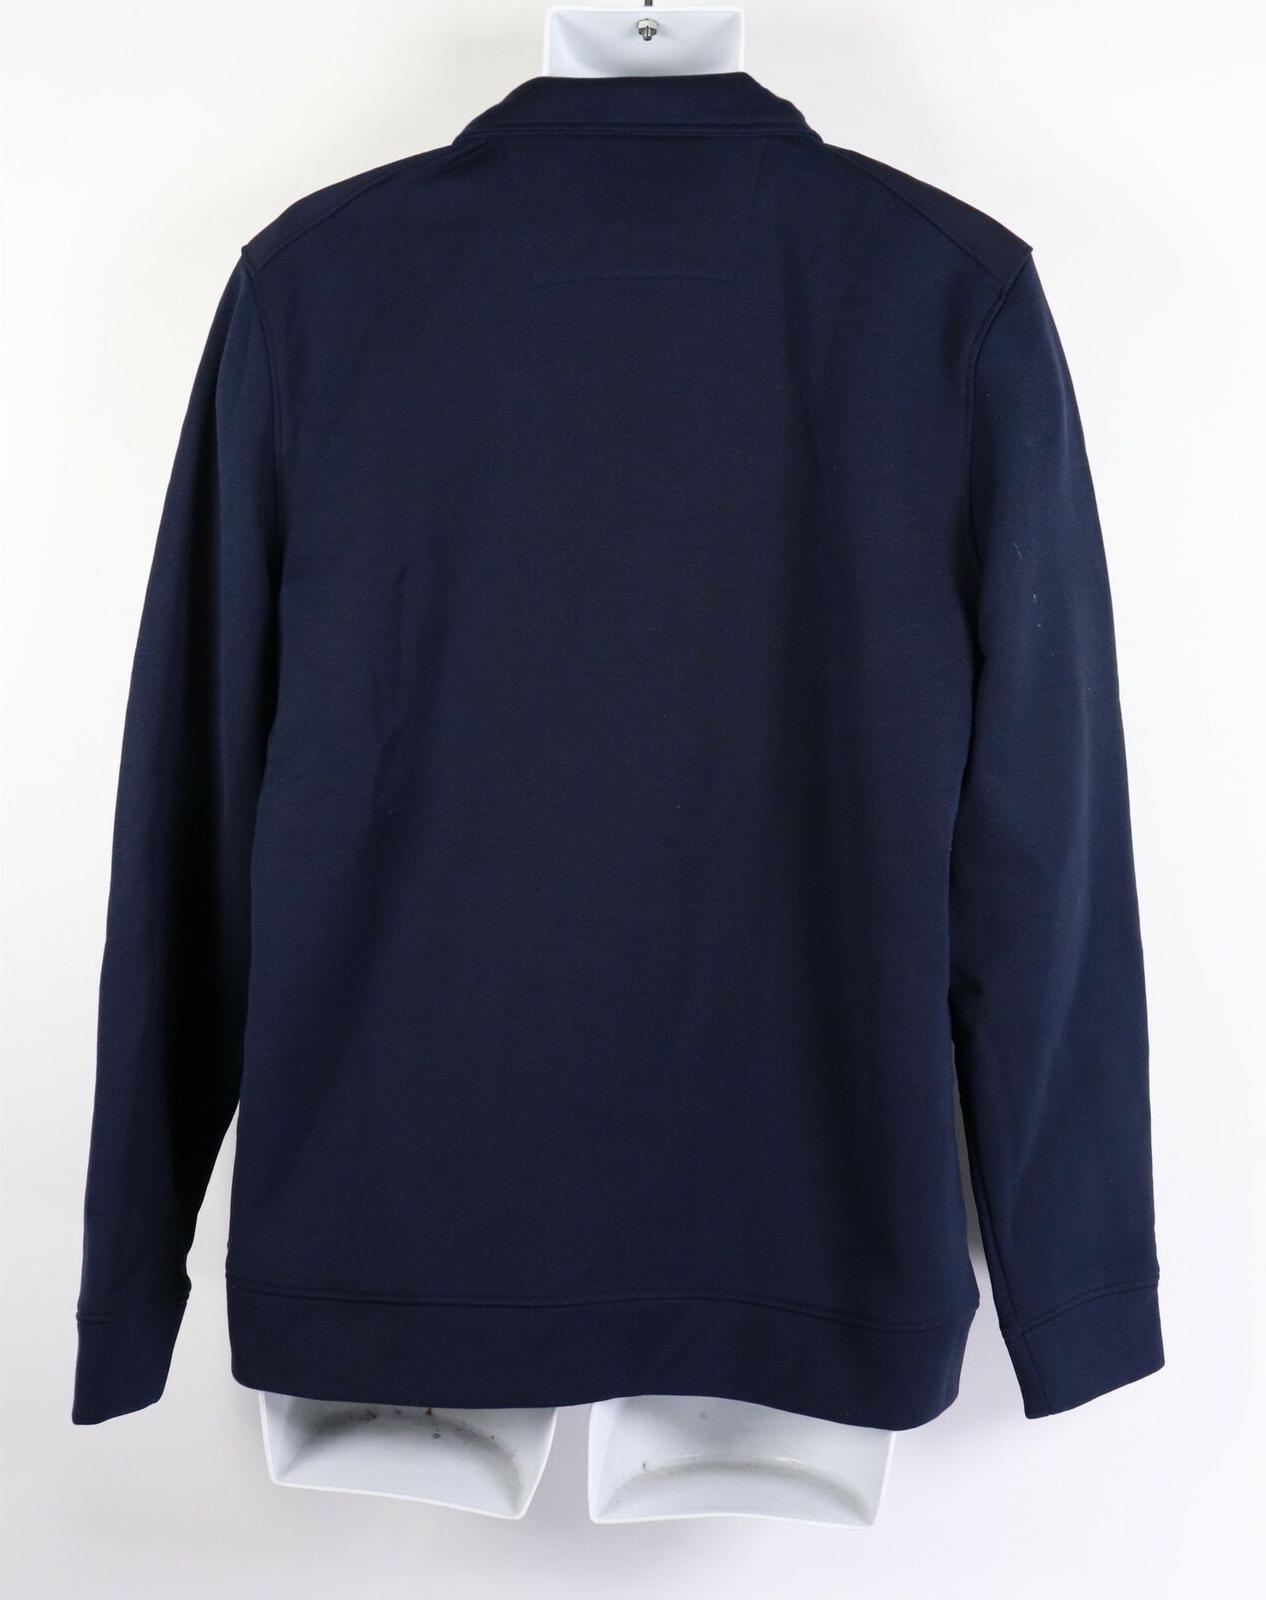 New Jacket L Blue